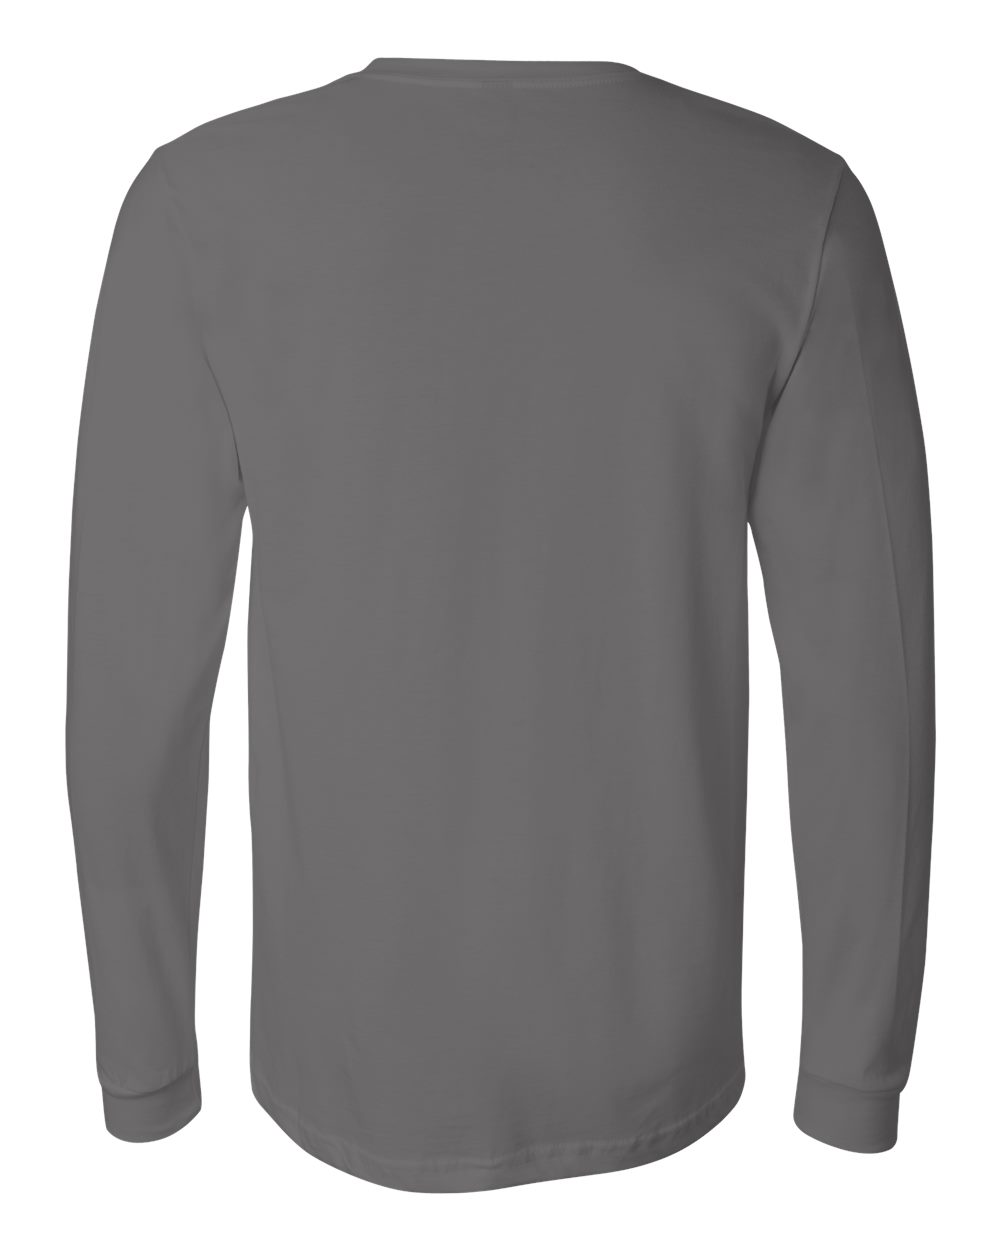 Bella-Canvas-Mens-Blank-Top-Long-Sleeve-Jersey-Tee-T-Shirt-3501-up-to-3XL thumbnail 10